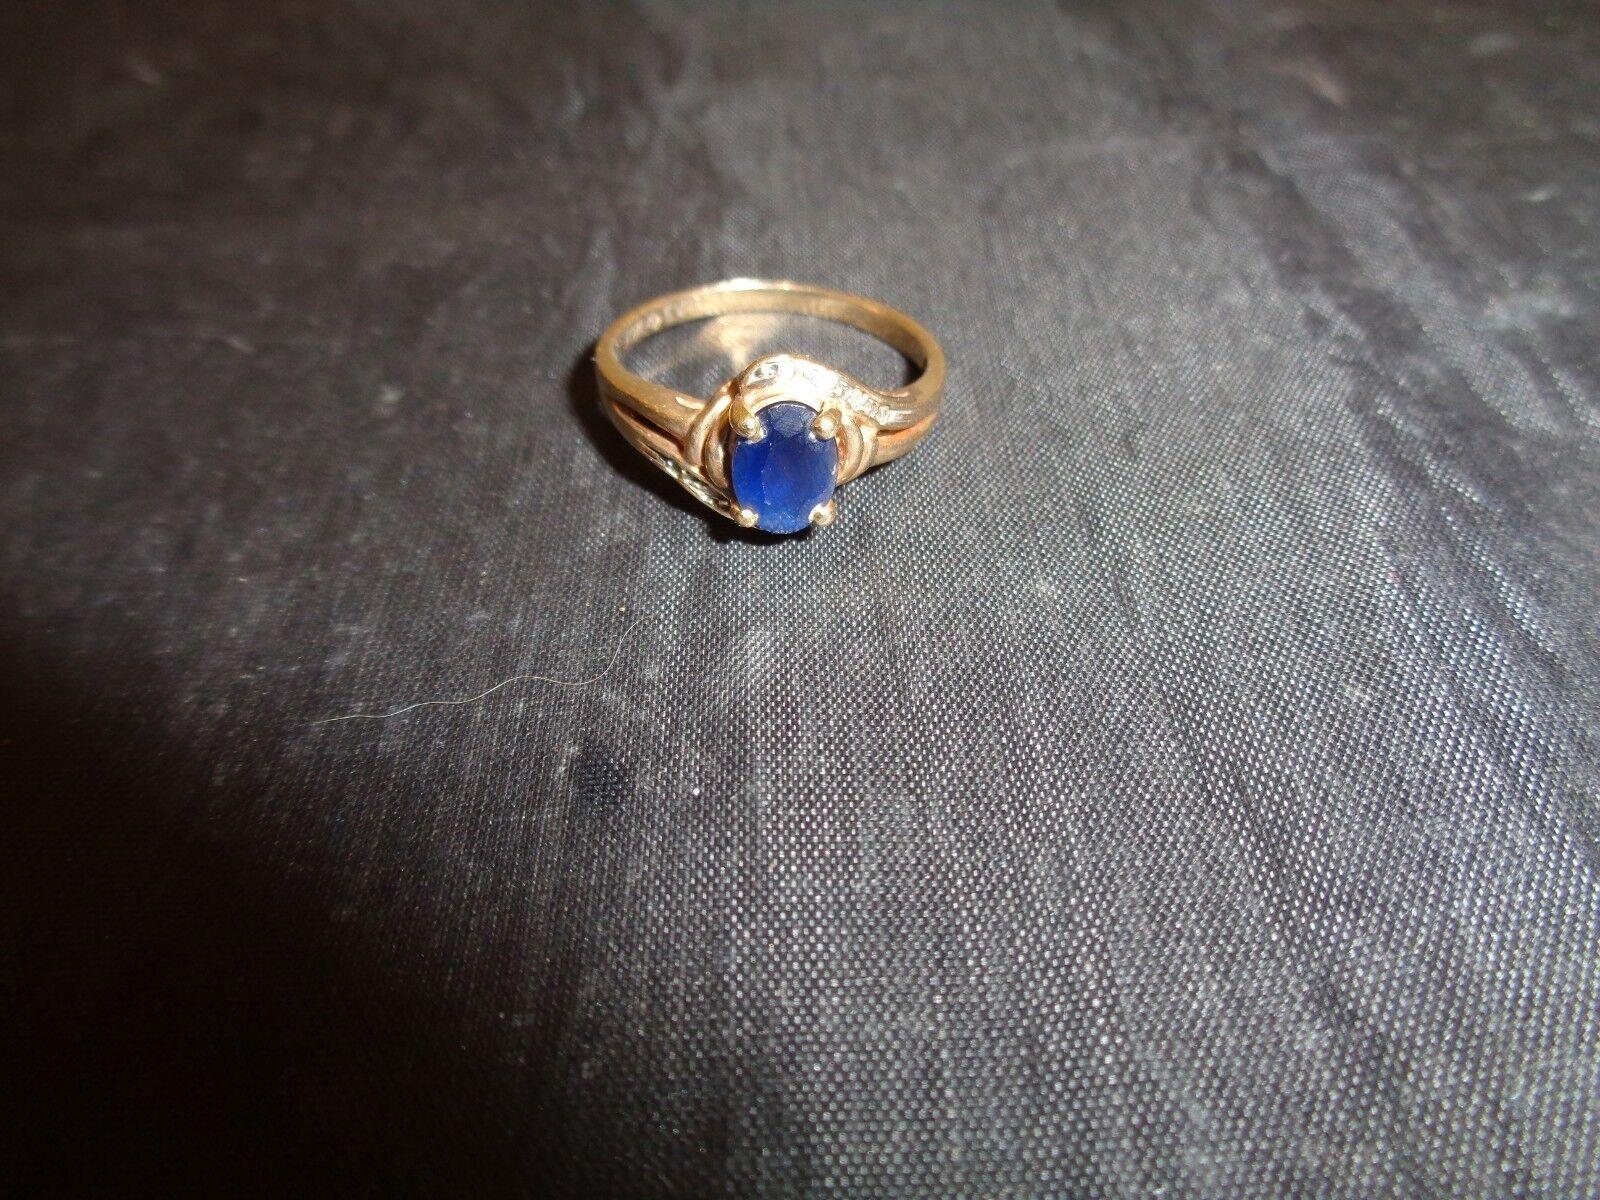 10K Ladies Ring Size 7.5  gold 2.4 Grams Dark bluee Stone